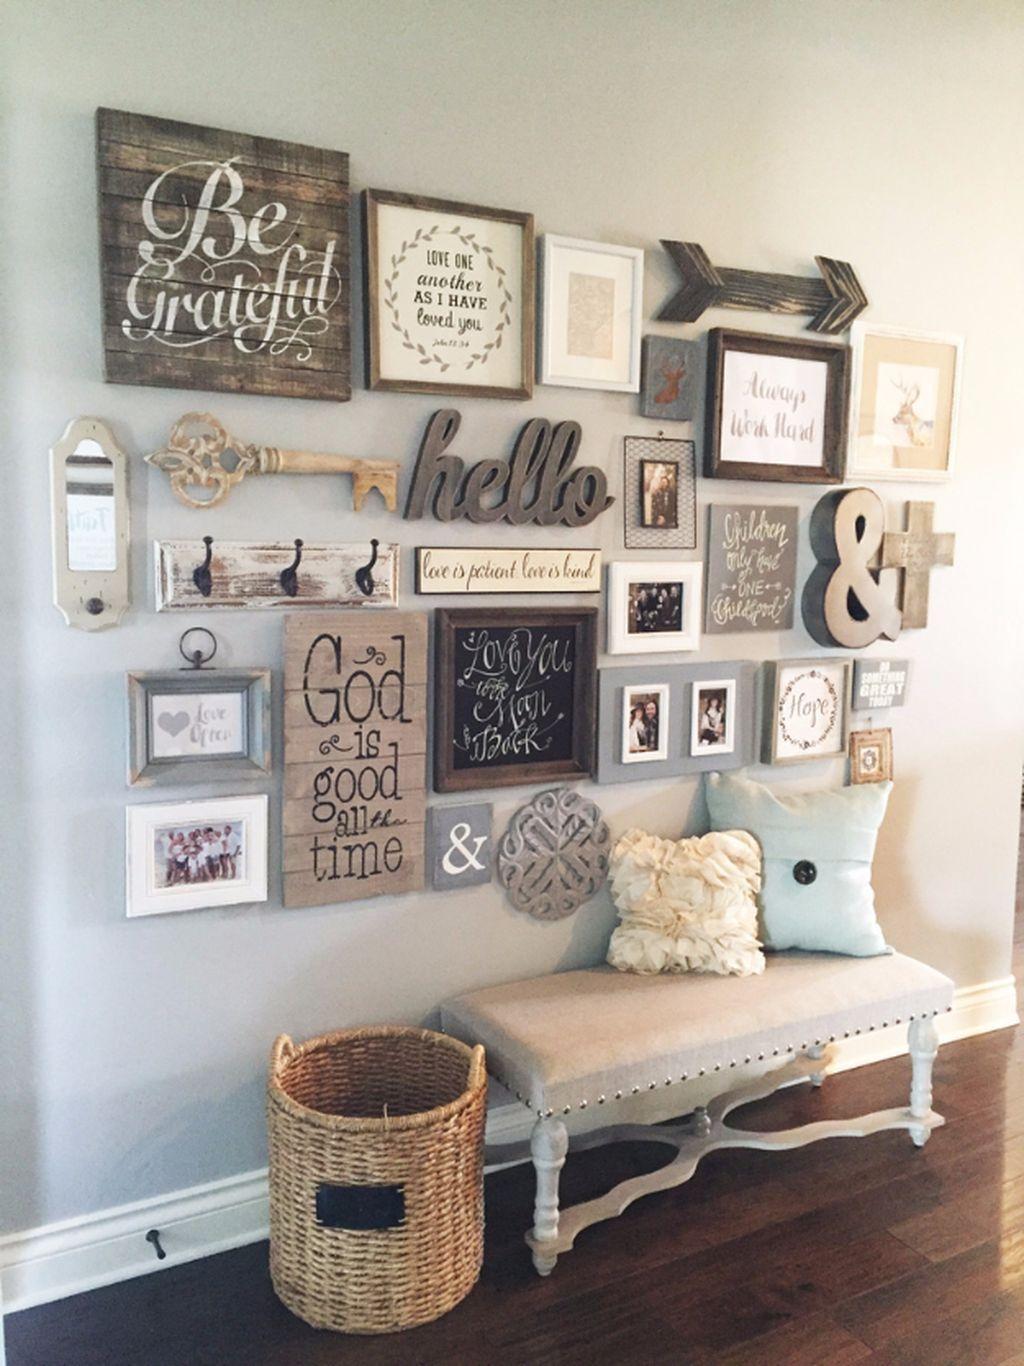 Exceptional Coole Dekoration Wohnzimmer Waende #4: Cool 37 Cozy Rustic Bedroom Design Ideas Https://homedecorish.com/2017